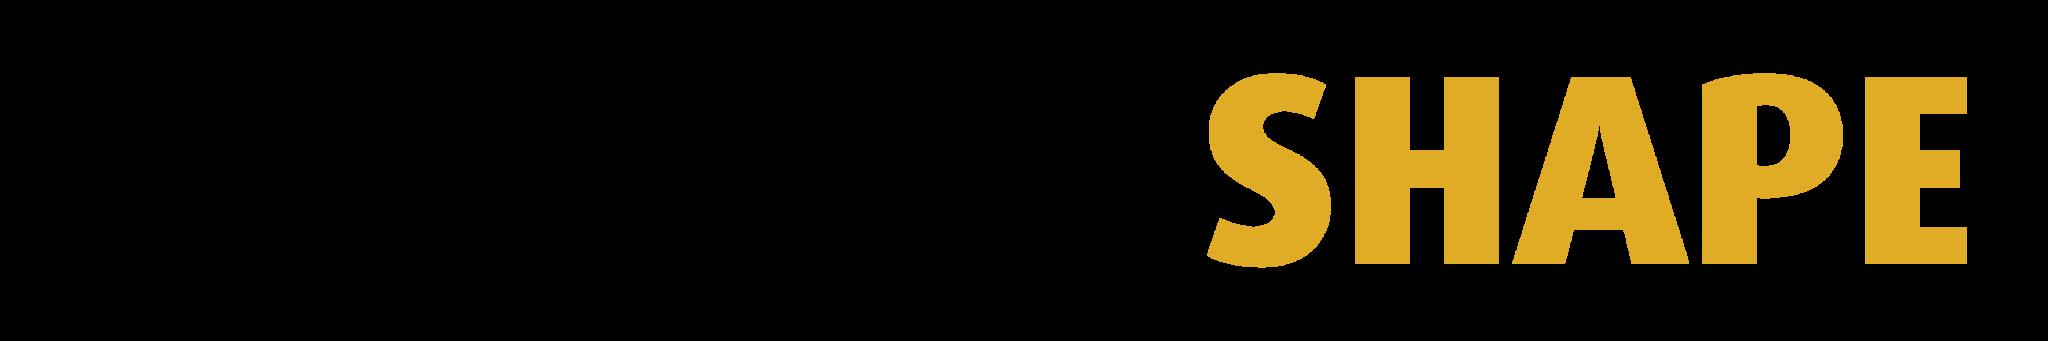 sharper-shape-logo